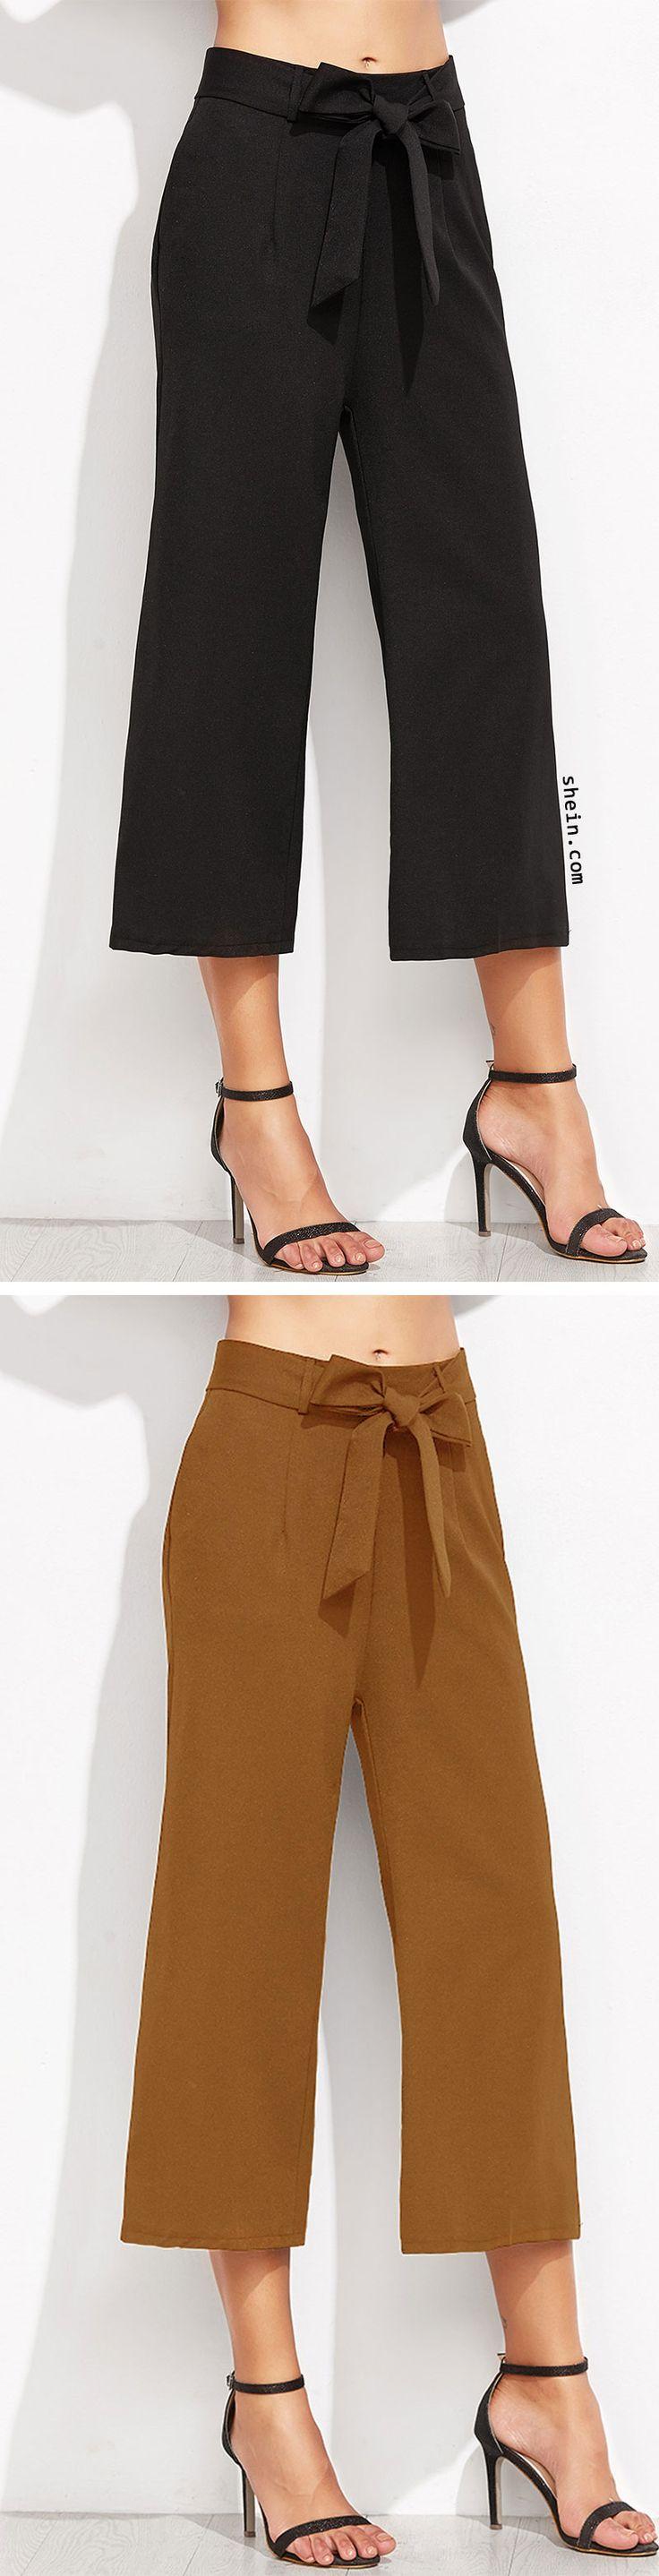 Cropped Self Tie Wide Leg Pants